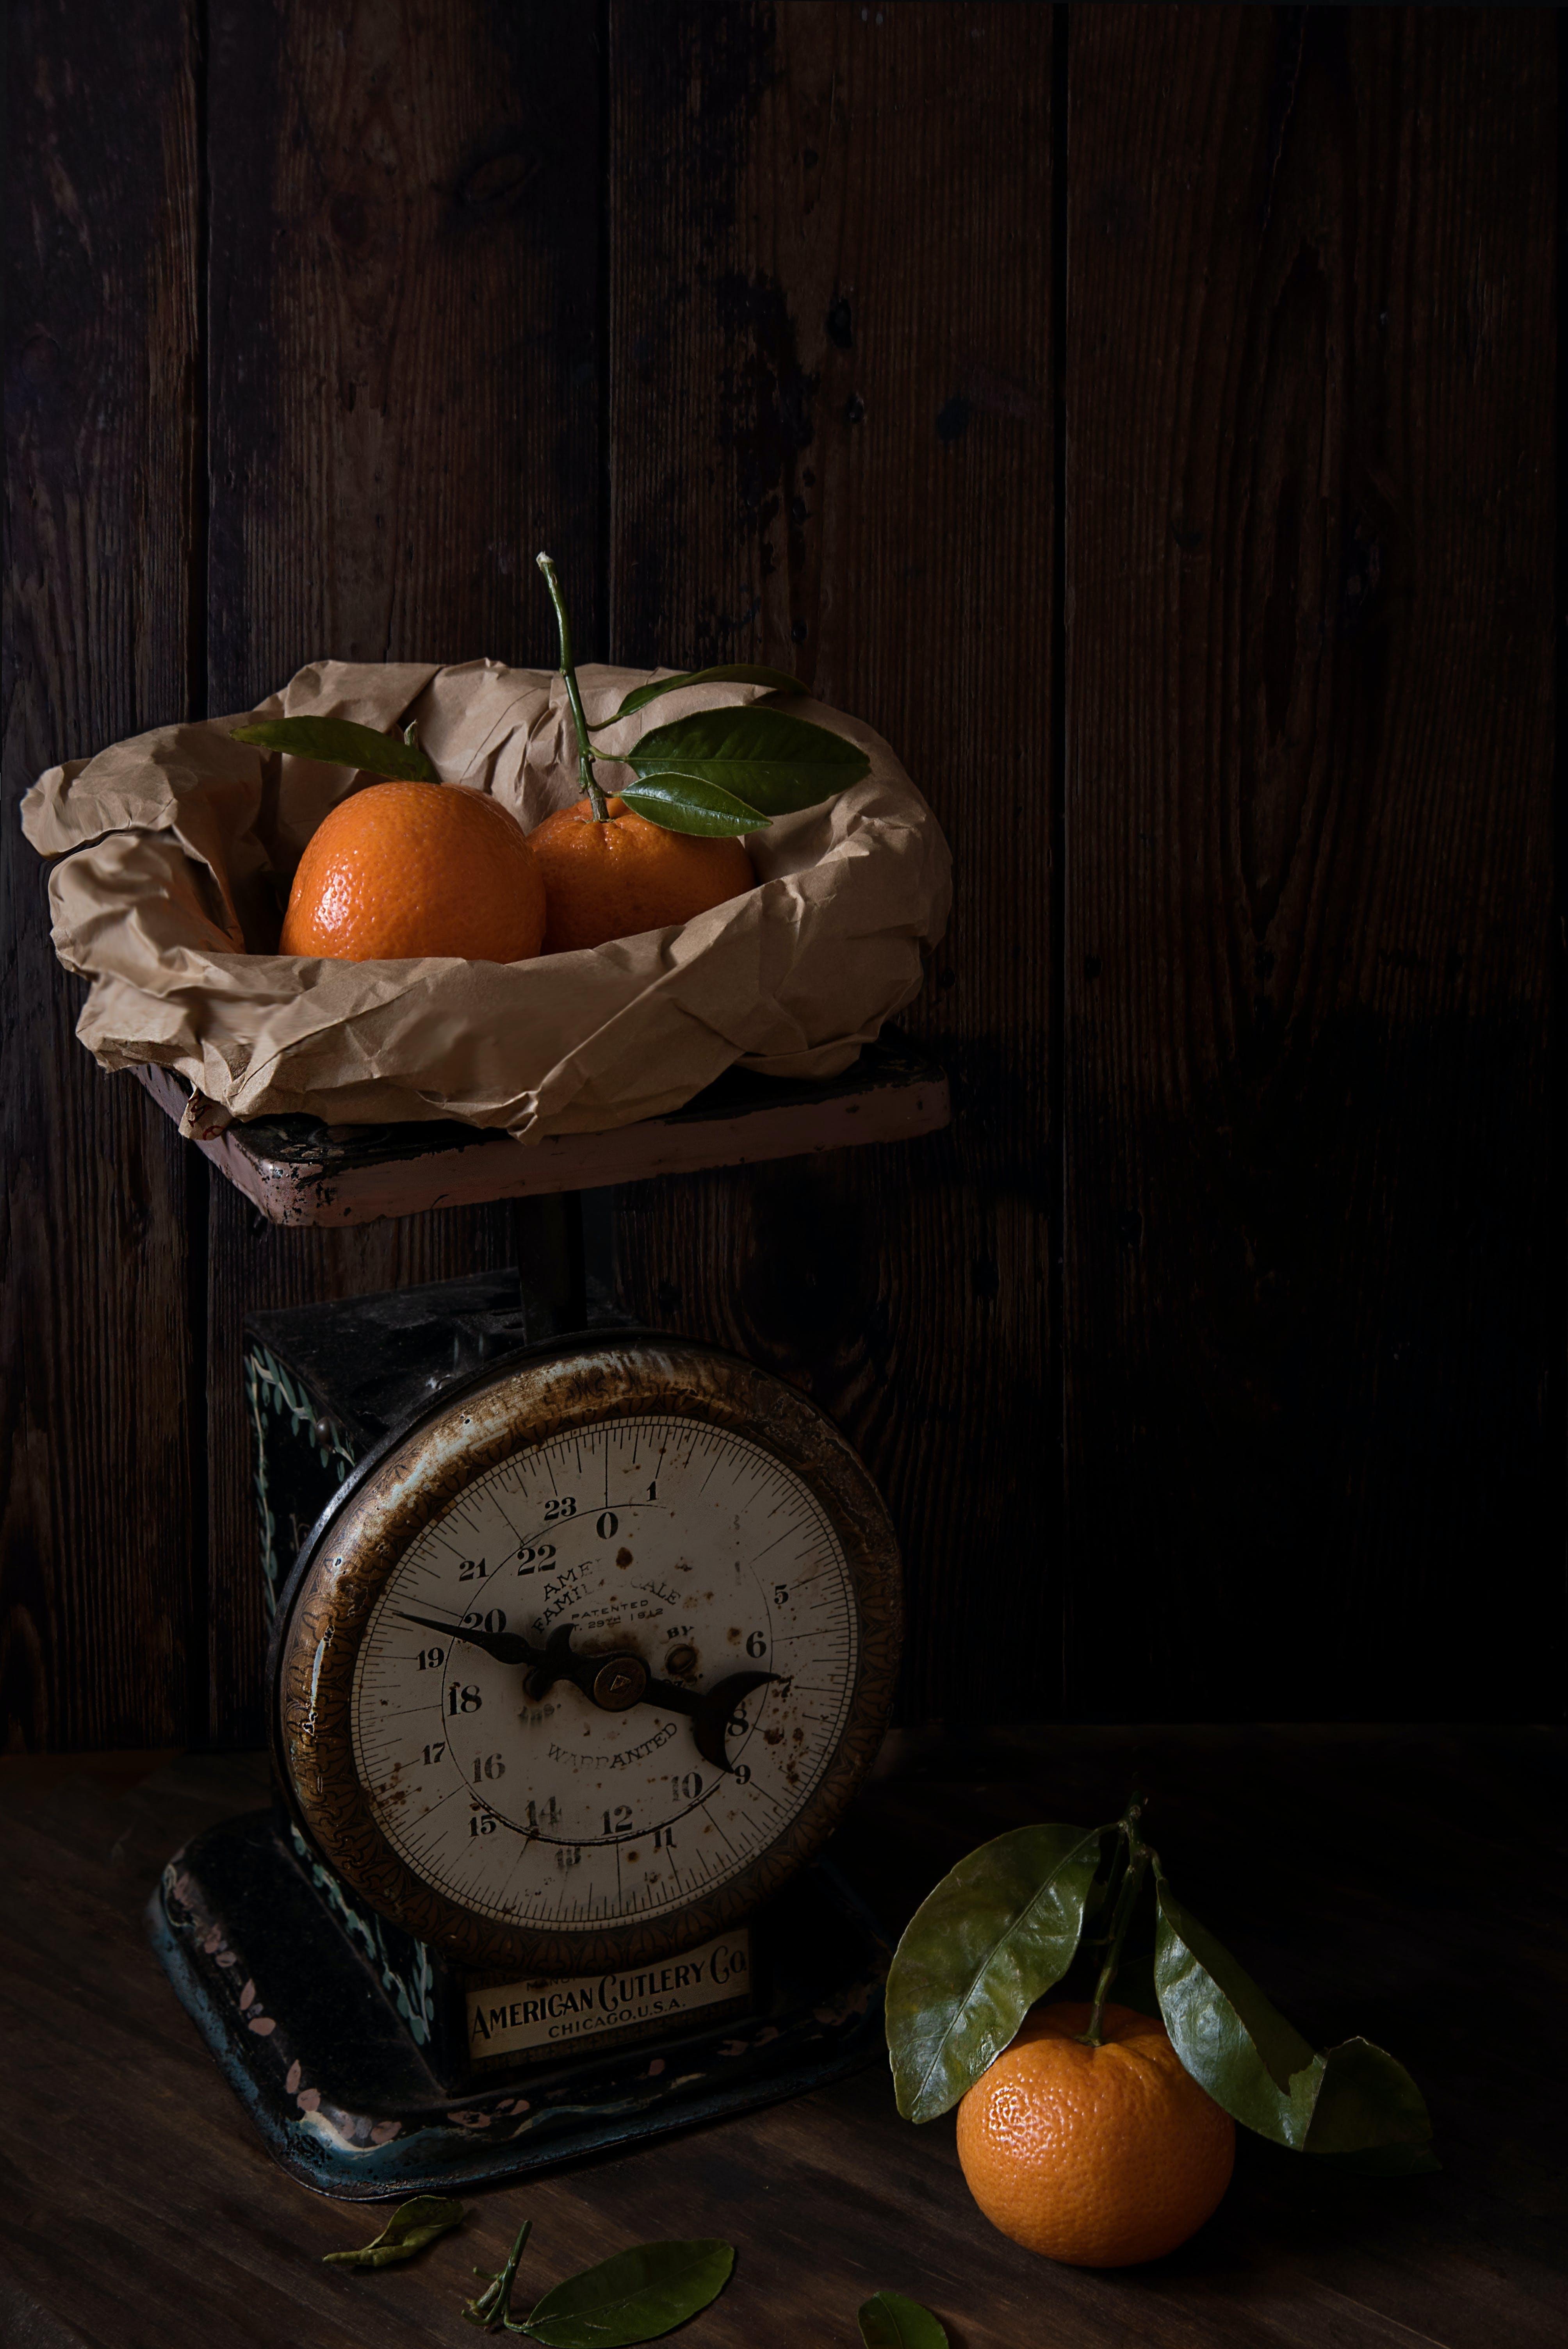 Three Orange Fruits and Analog Scale